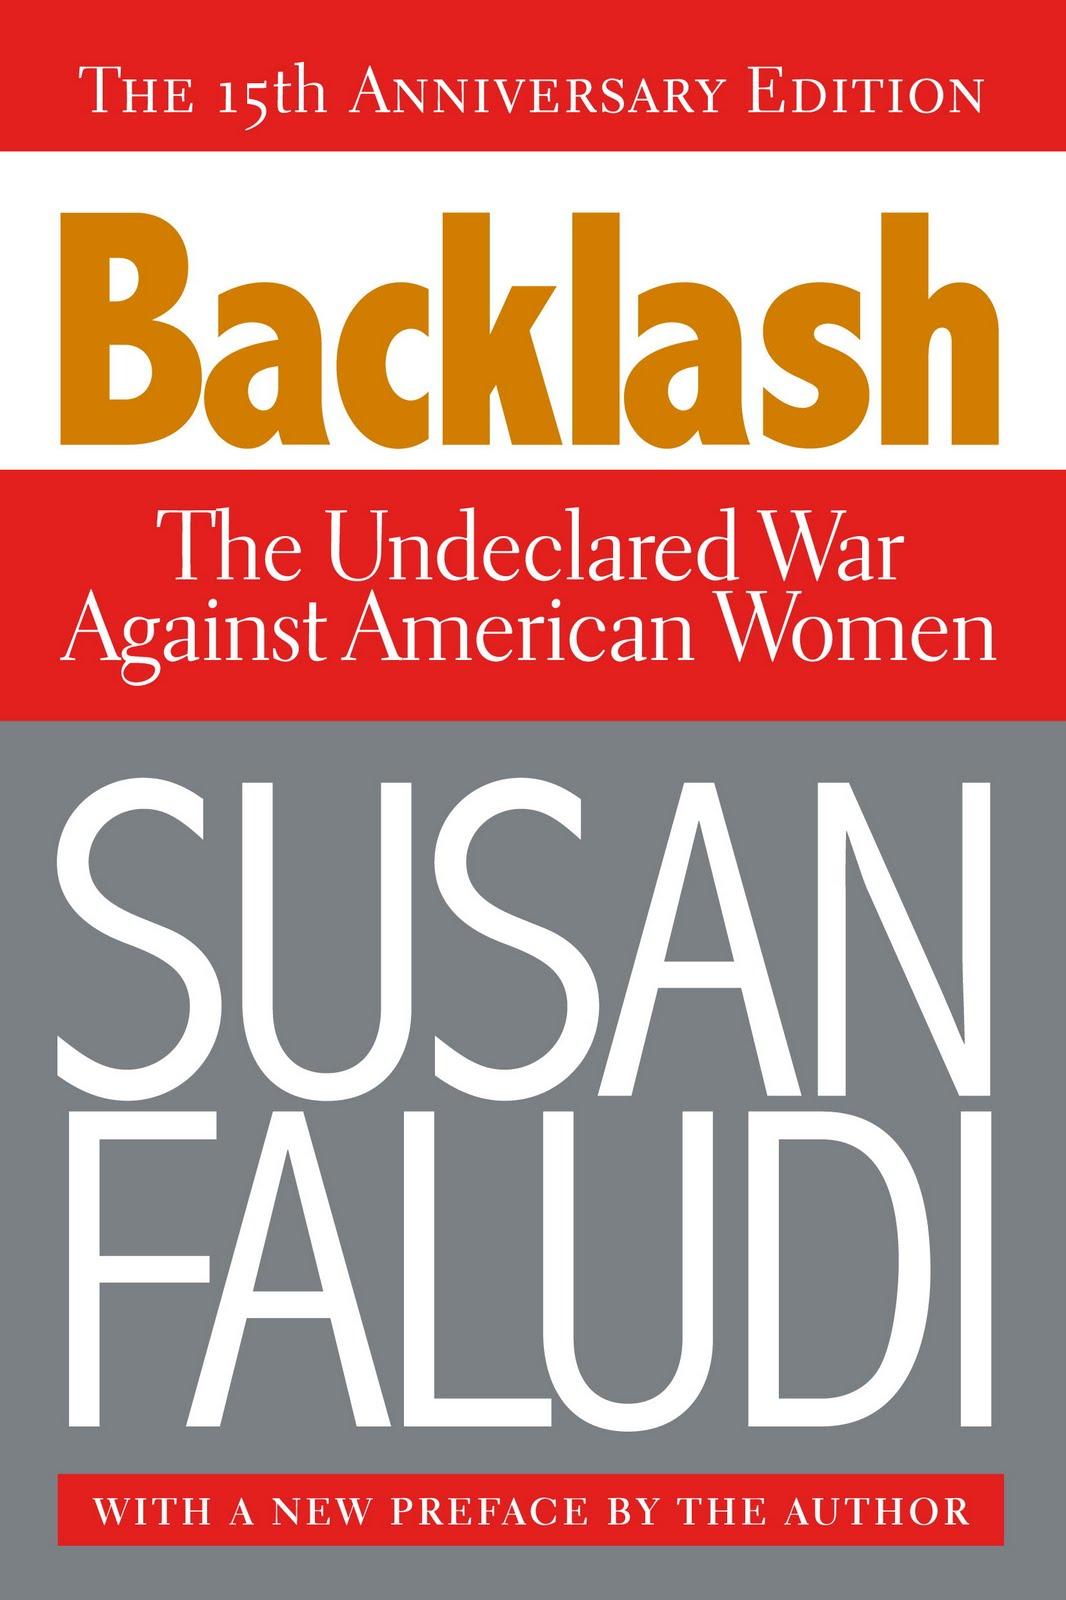 backlash thesis